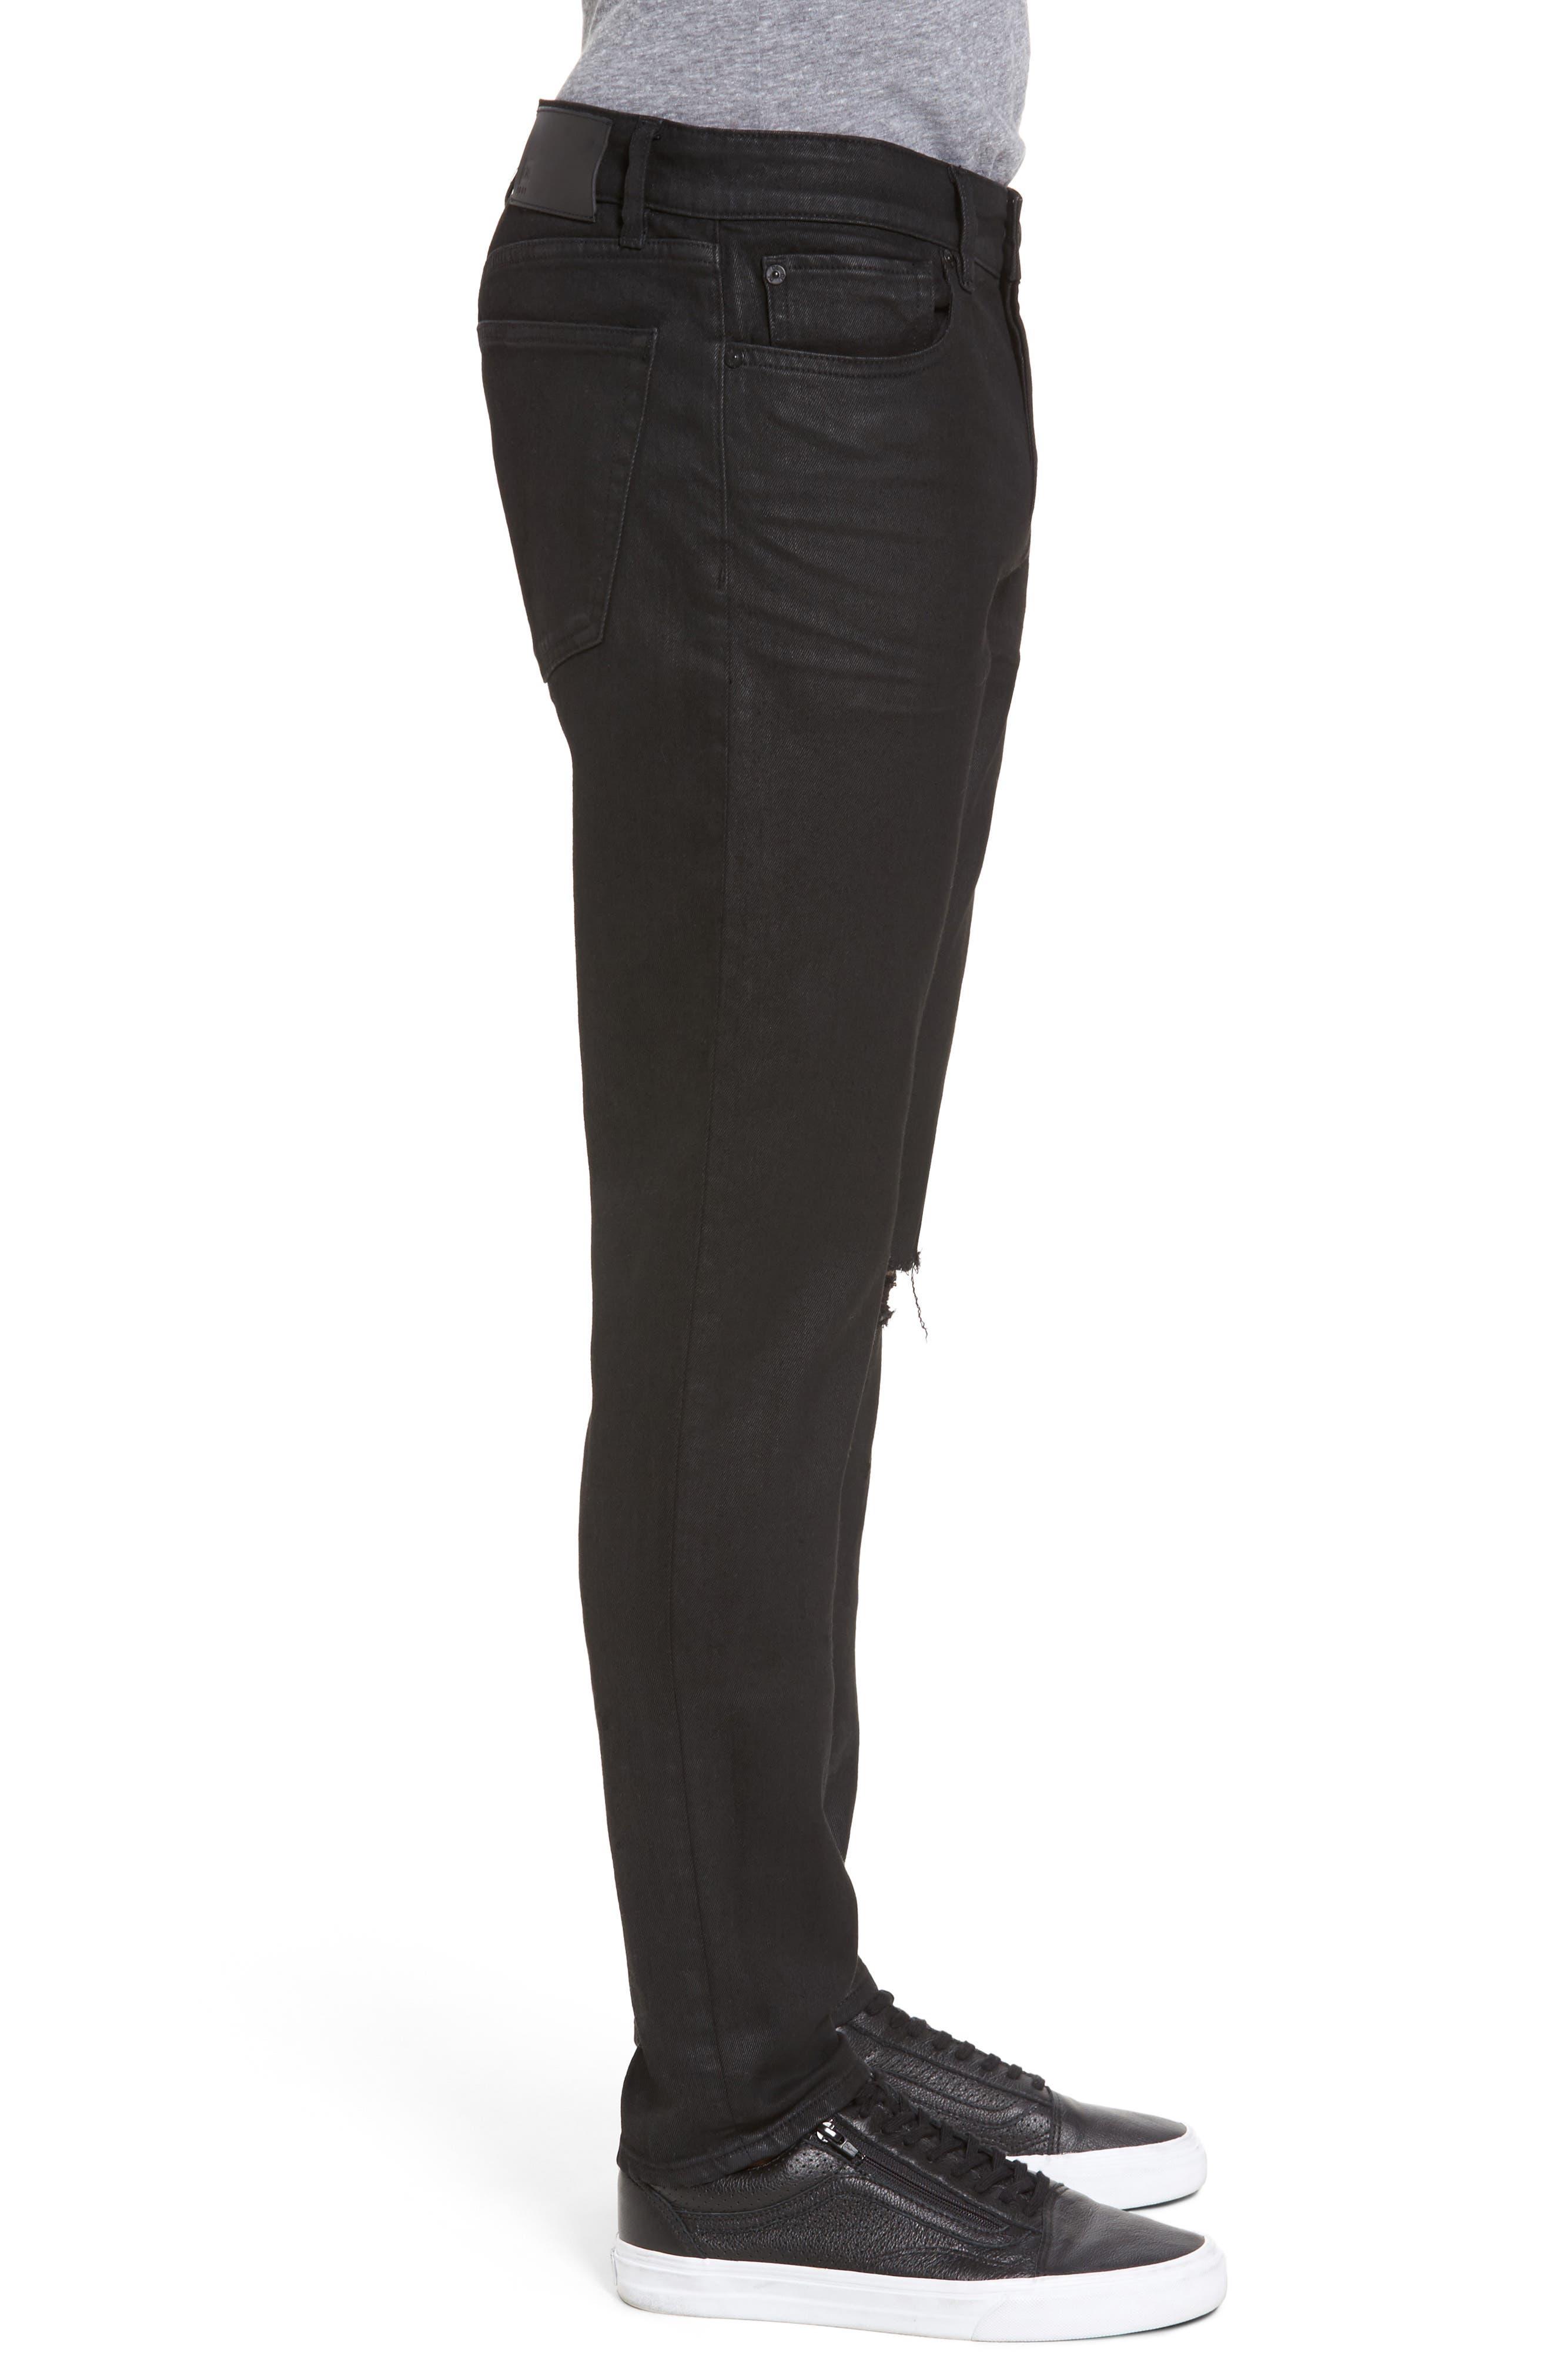 Hunter Skinny Jeans,                             Alternate thumbnail 3, color,                             VICE